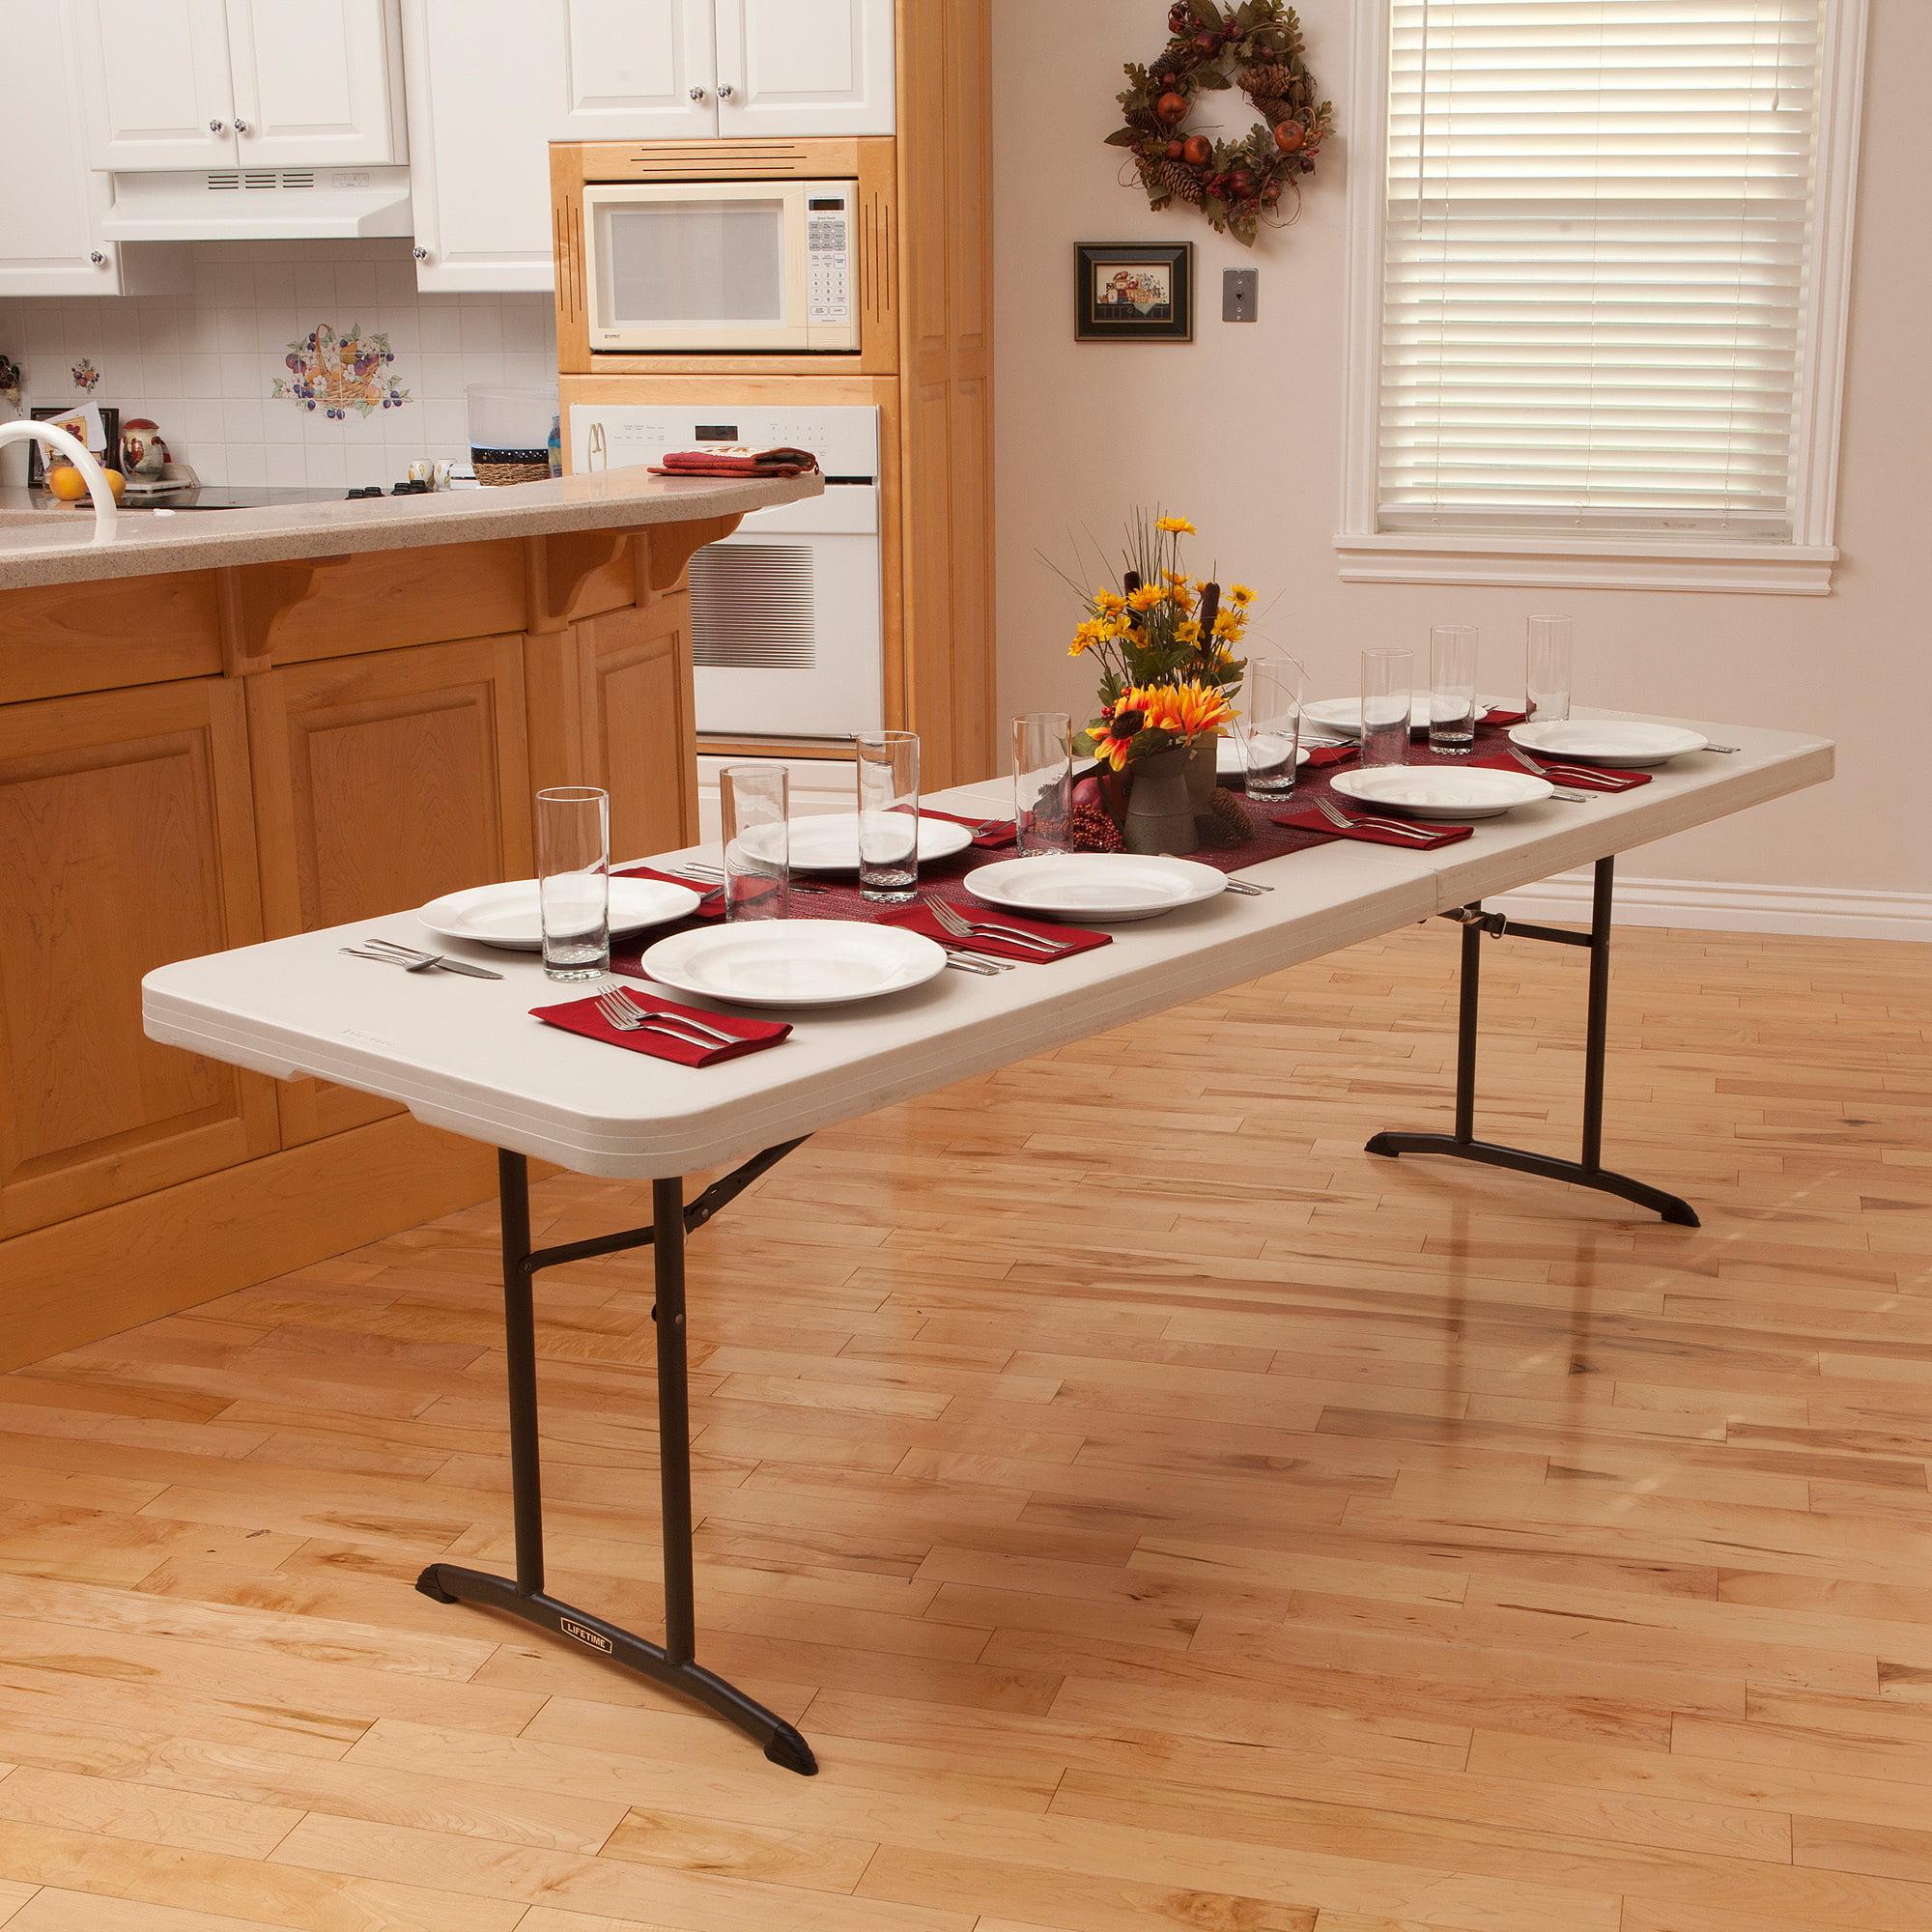 Lifetime 8' Fold-In-Half Table, Almond, 80175